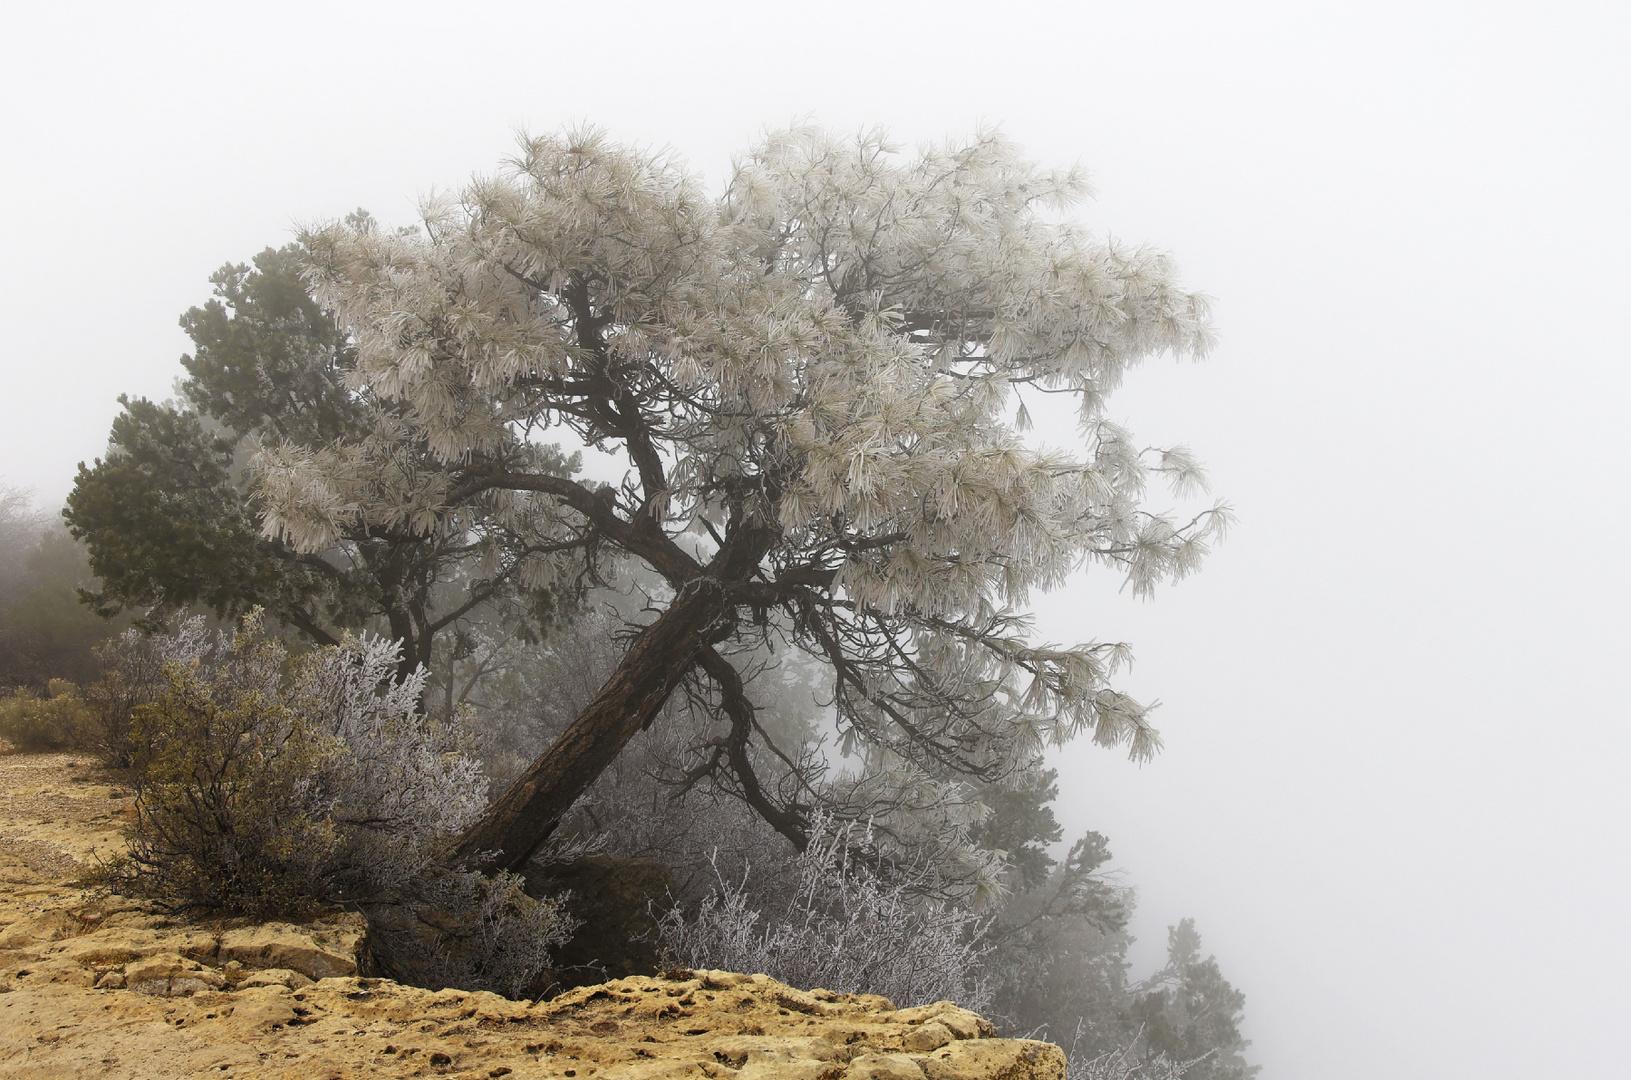 Grand Canyon - Life on the Edge